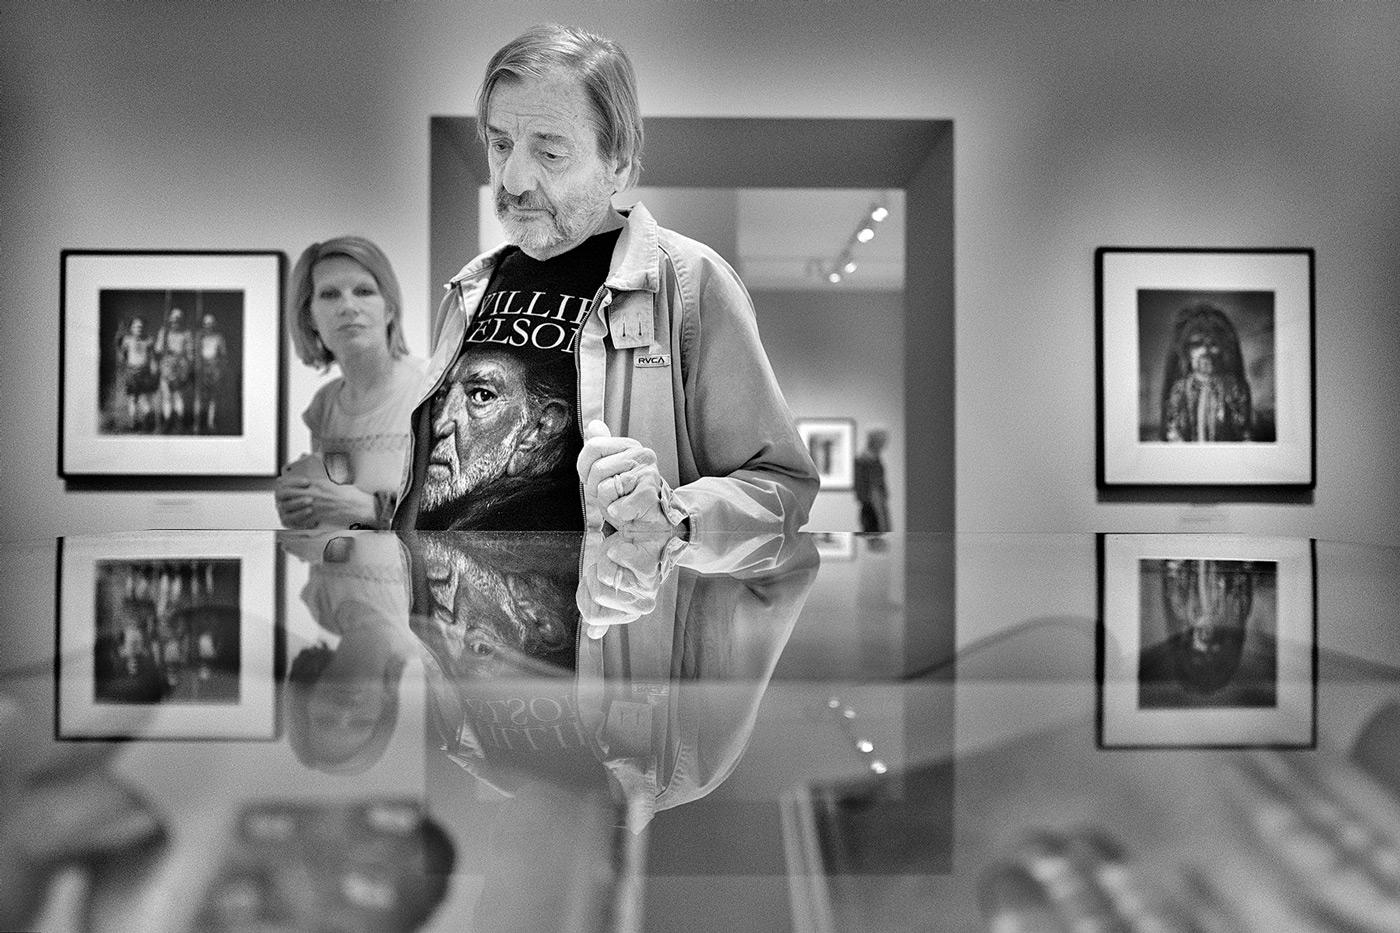 William-Bullard_USA_Pictures-at-an-Exhibition_18.jpeg